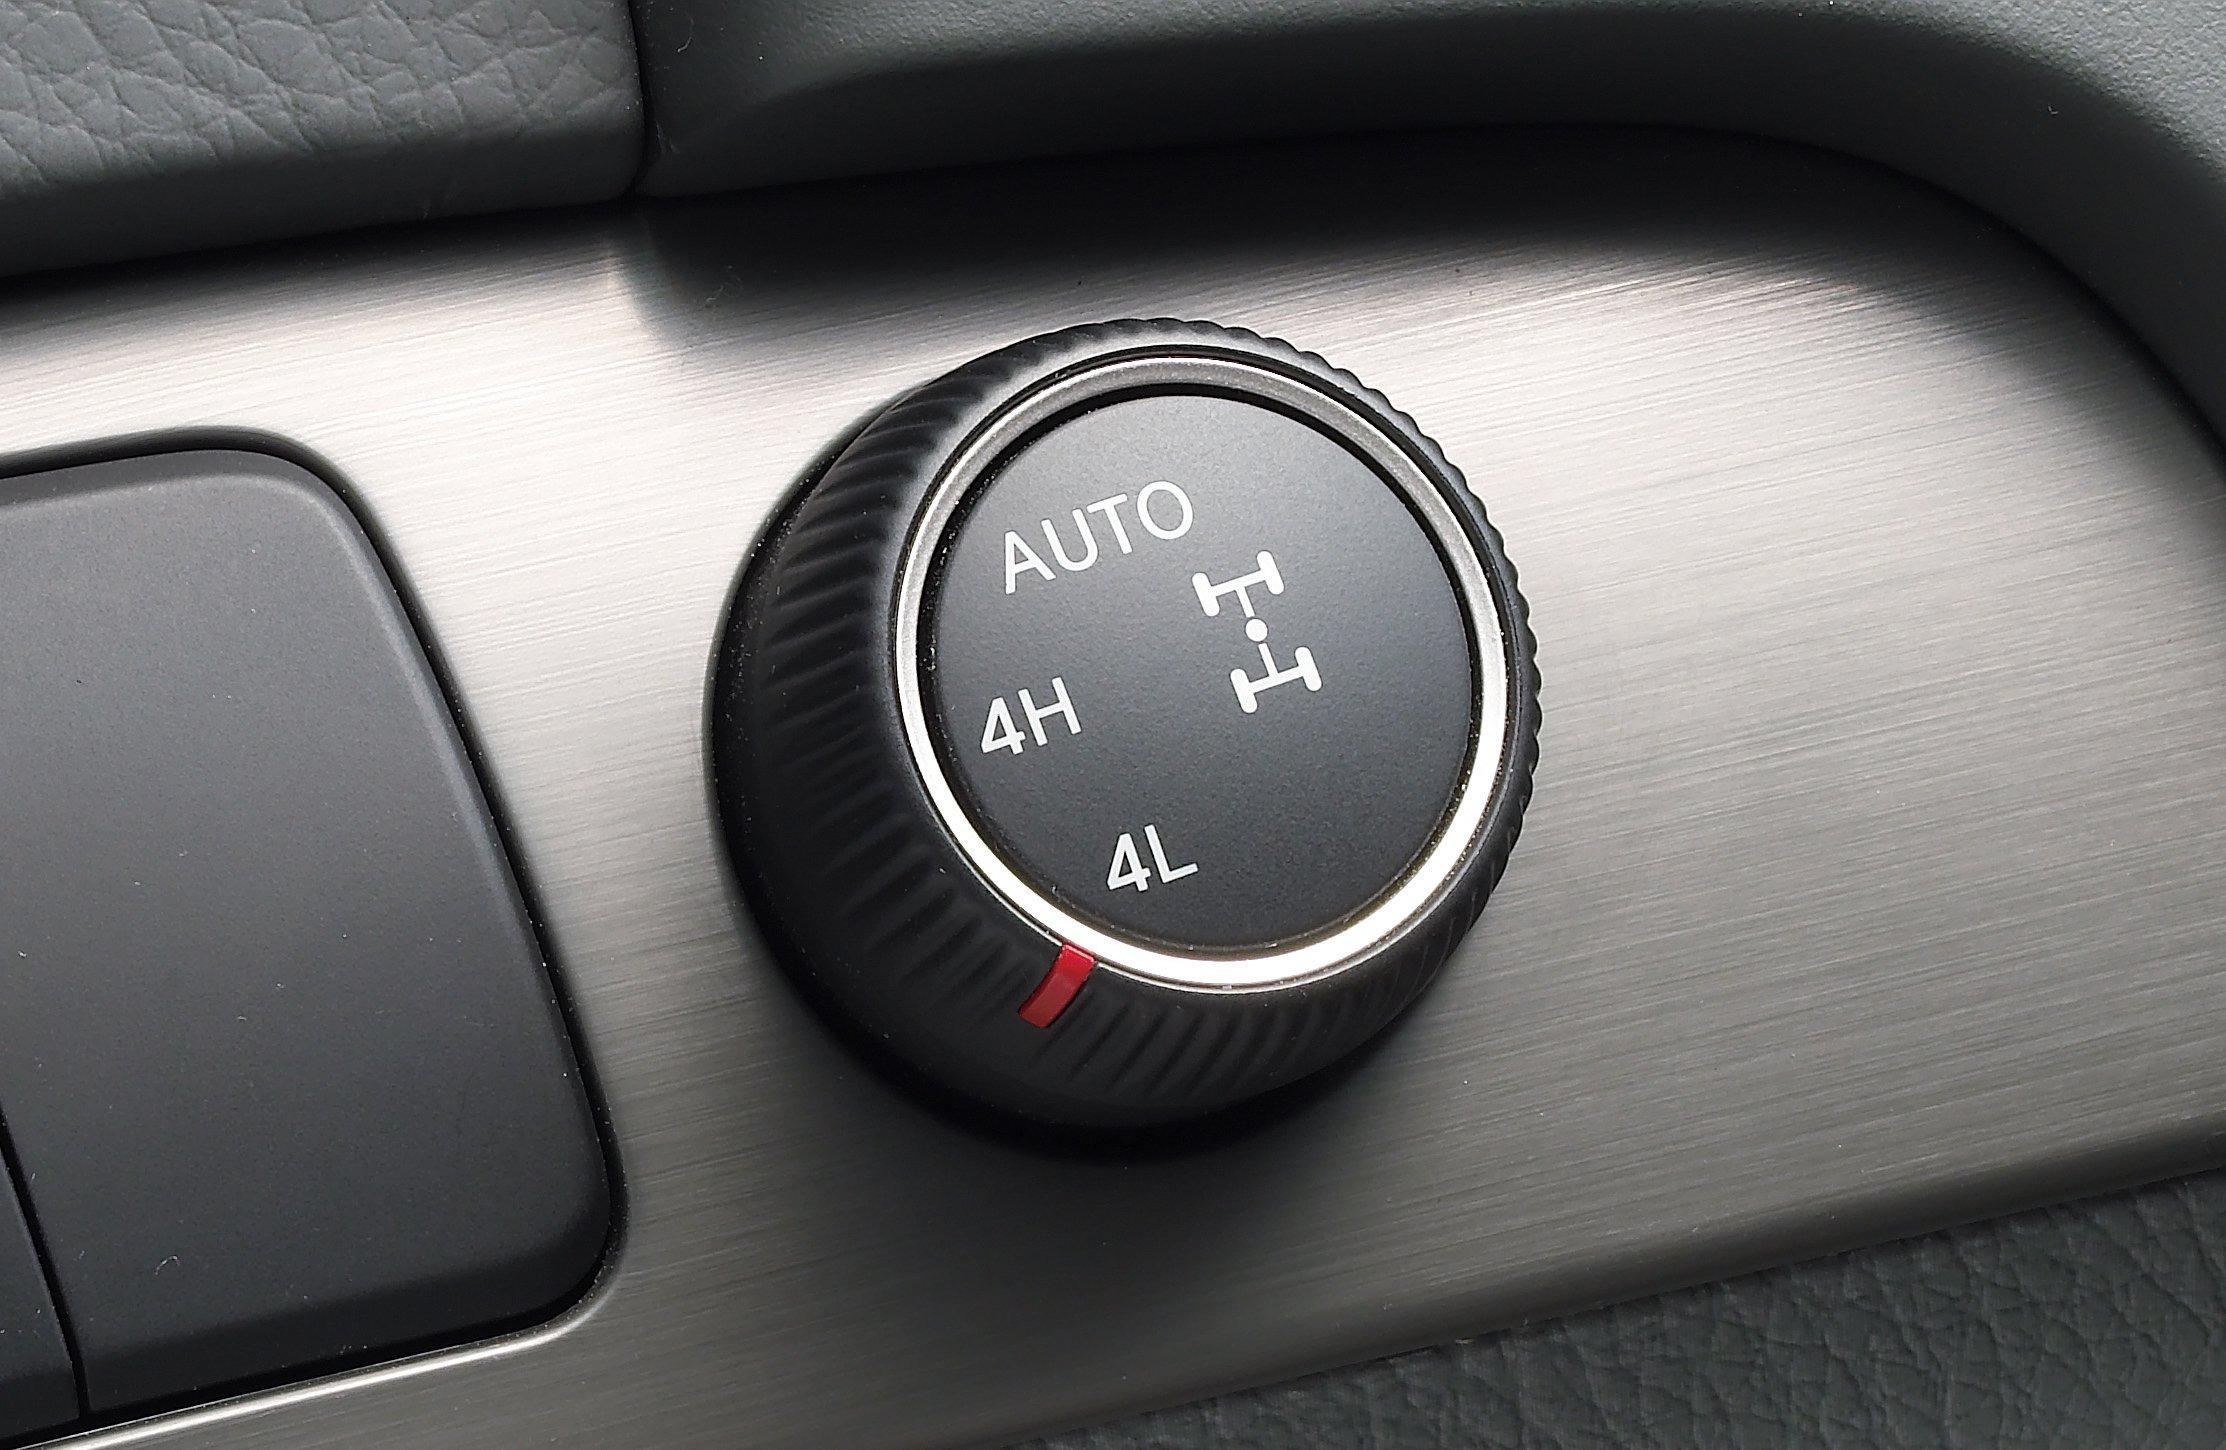 Особенности эксплуатации Nissan X-Trail II с вариатором (CVT) в холодную погоду